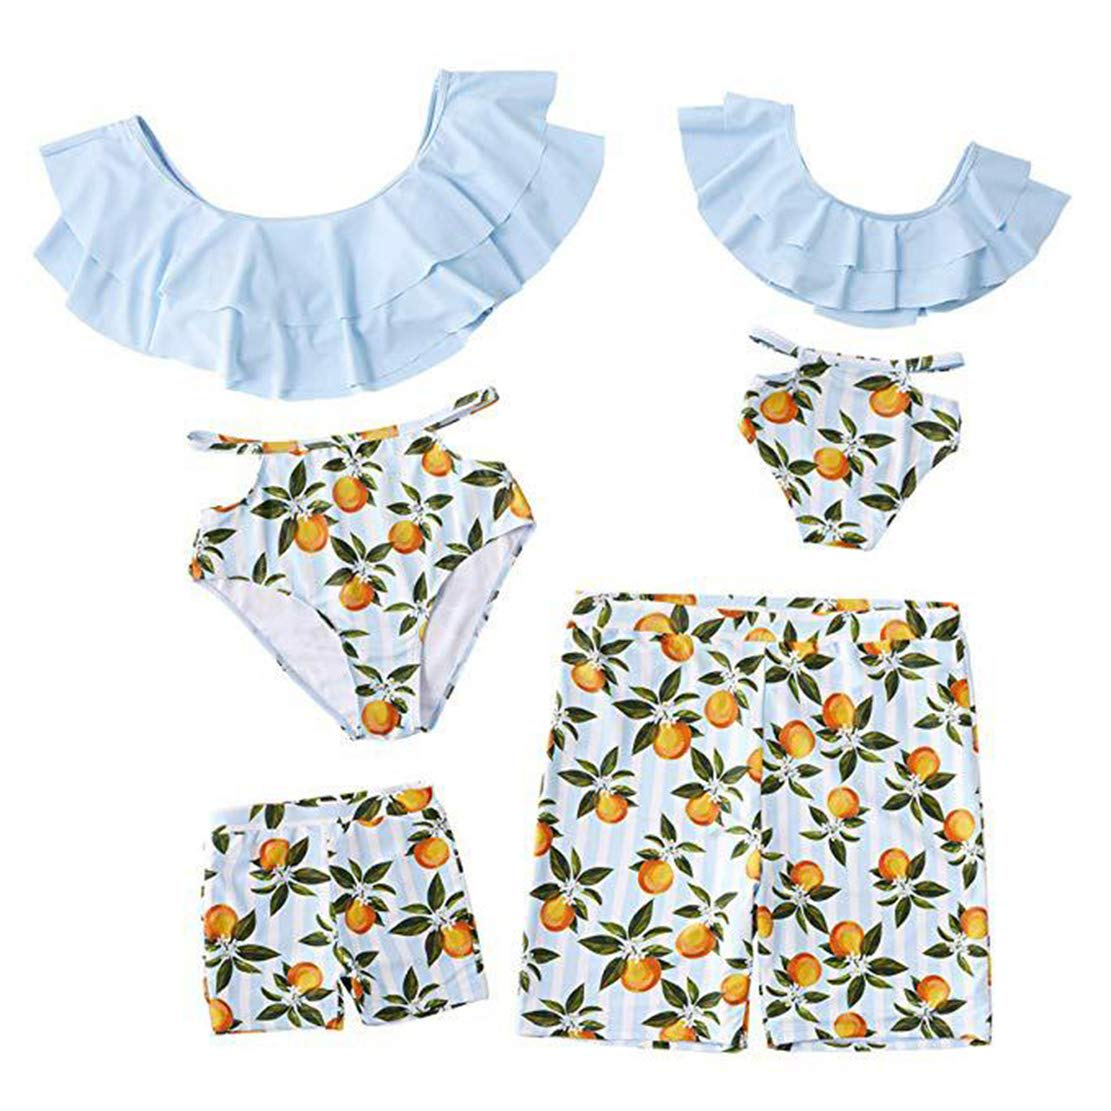 Conjunto Familiar Traje de Ba/ño 2 Pieza Bikini Madre e Hija Traje de Ba/ño Padre e Hijo Ba/ñador Imprimiendo Primavera Verano